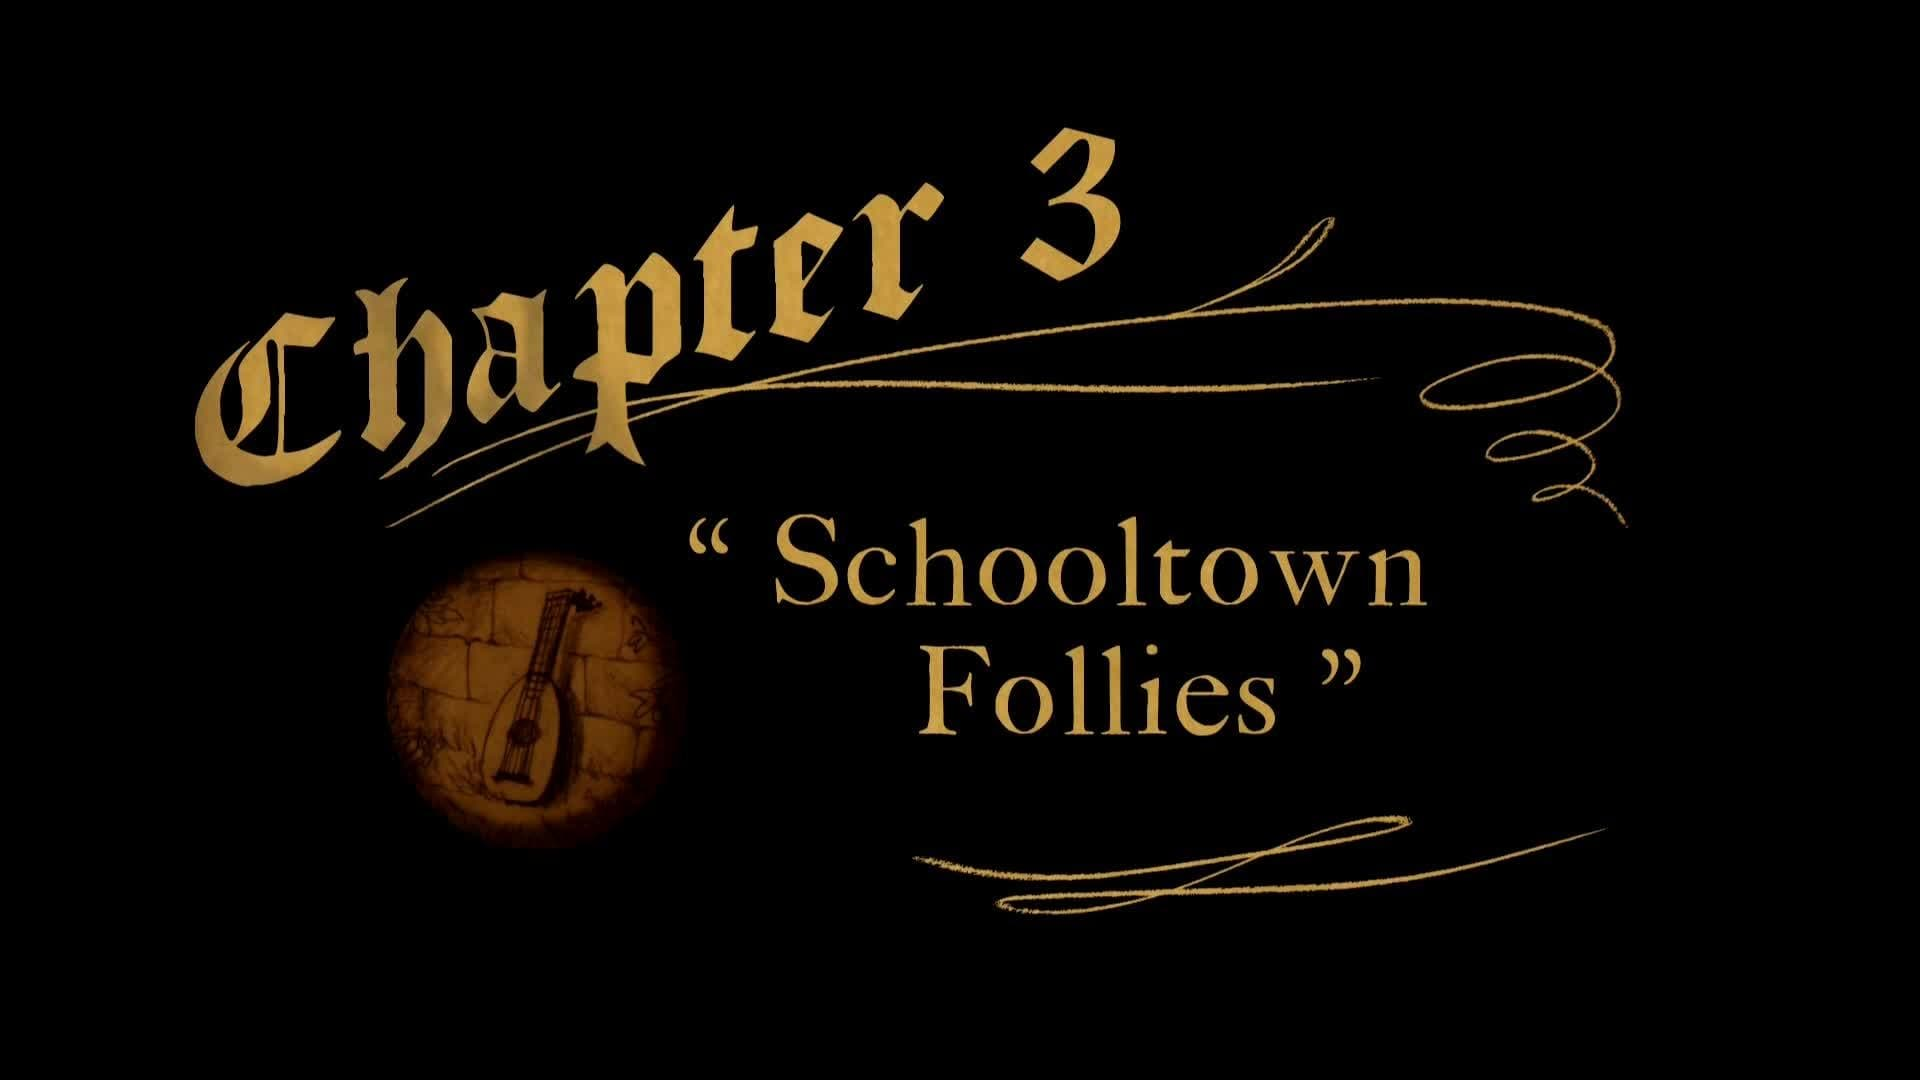 Over the garden wall season 1 episode 3 schooltown follies beaufort county now for Over the garden wall episode 3